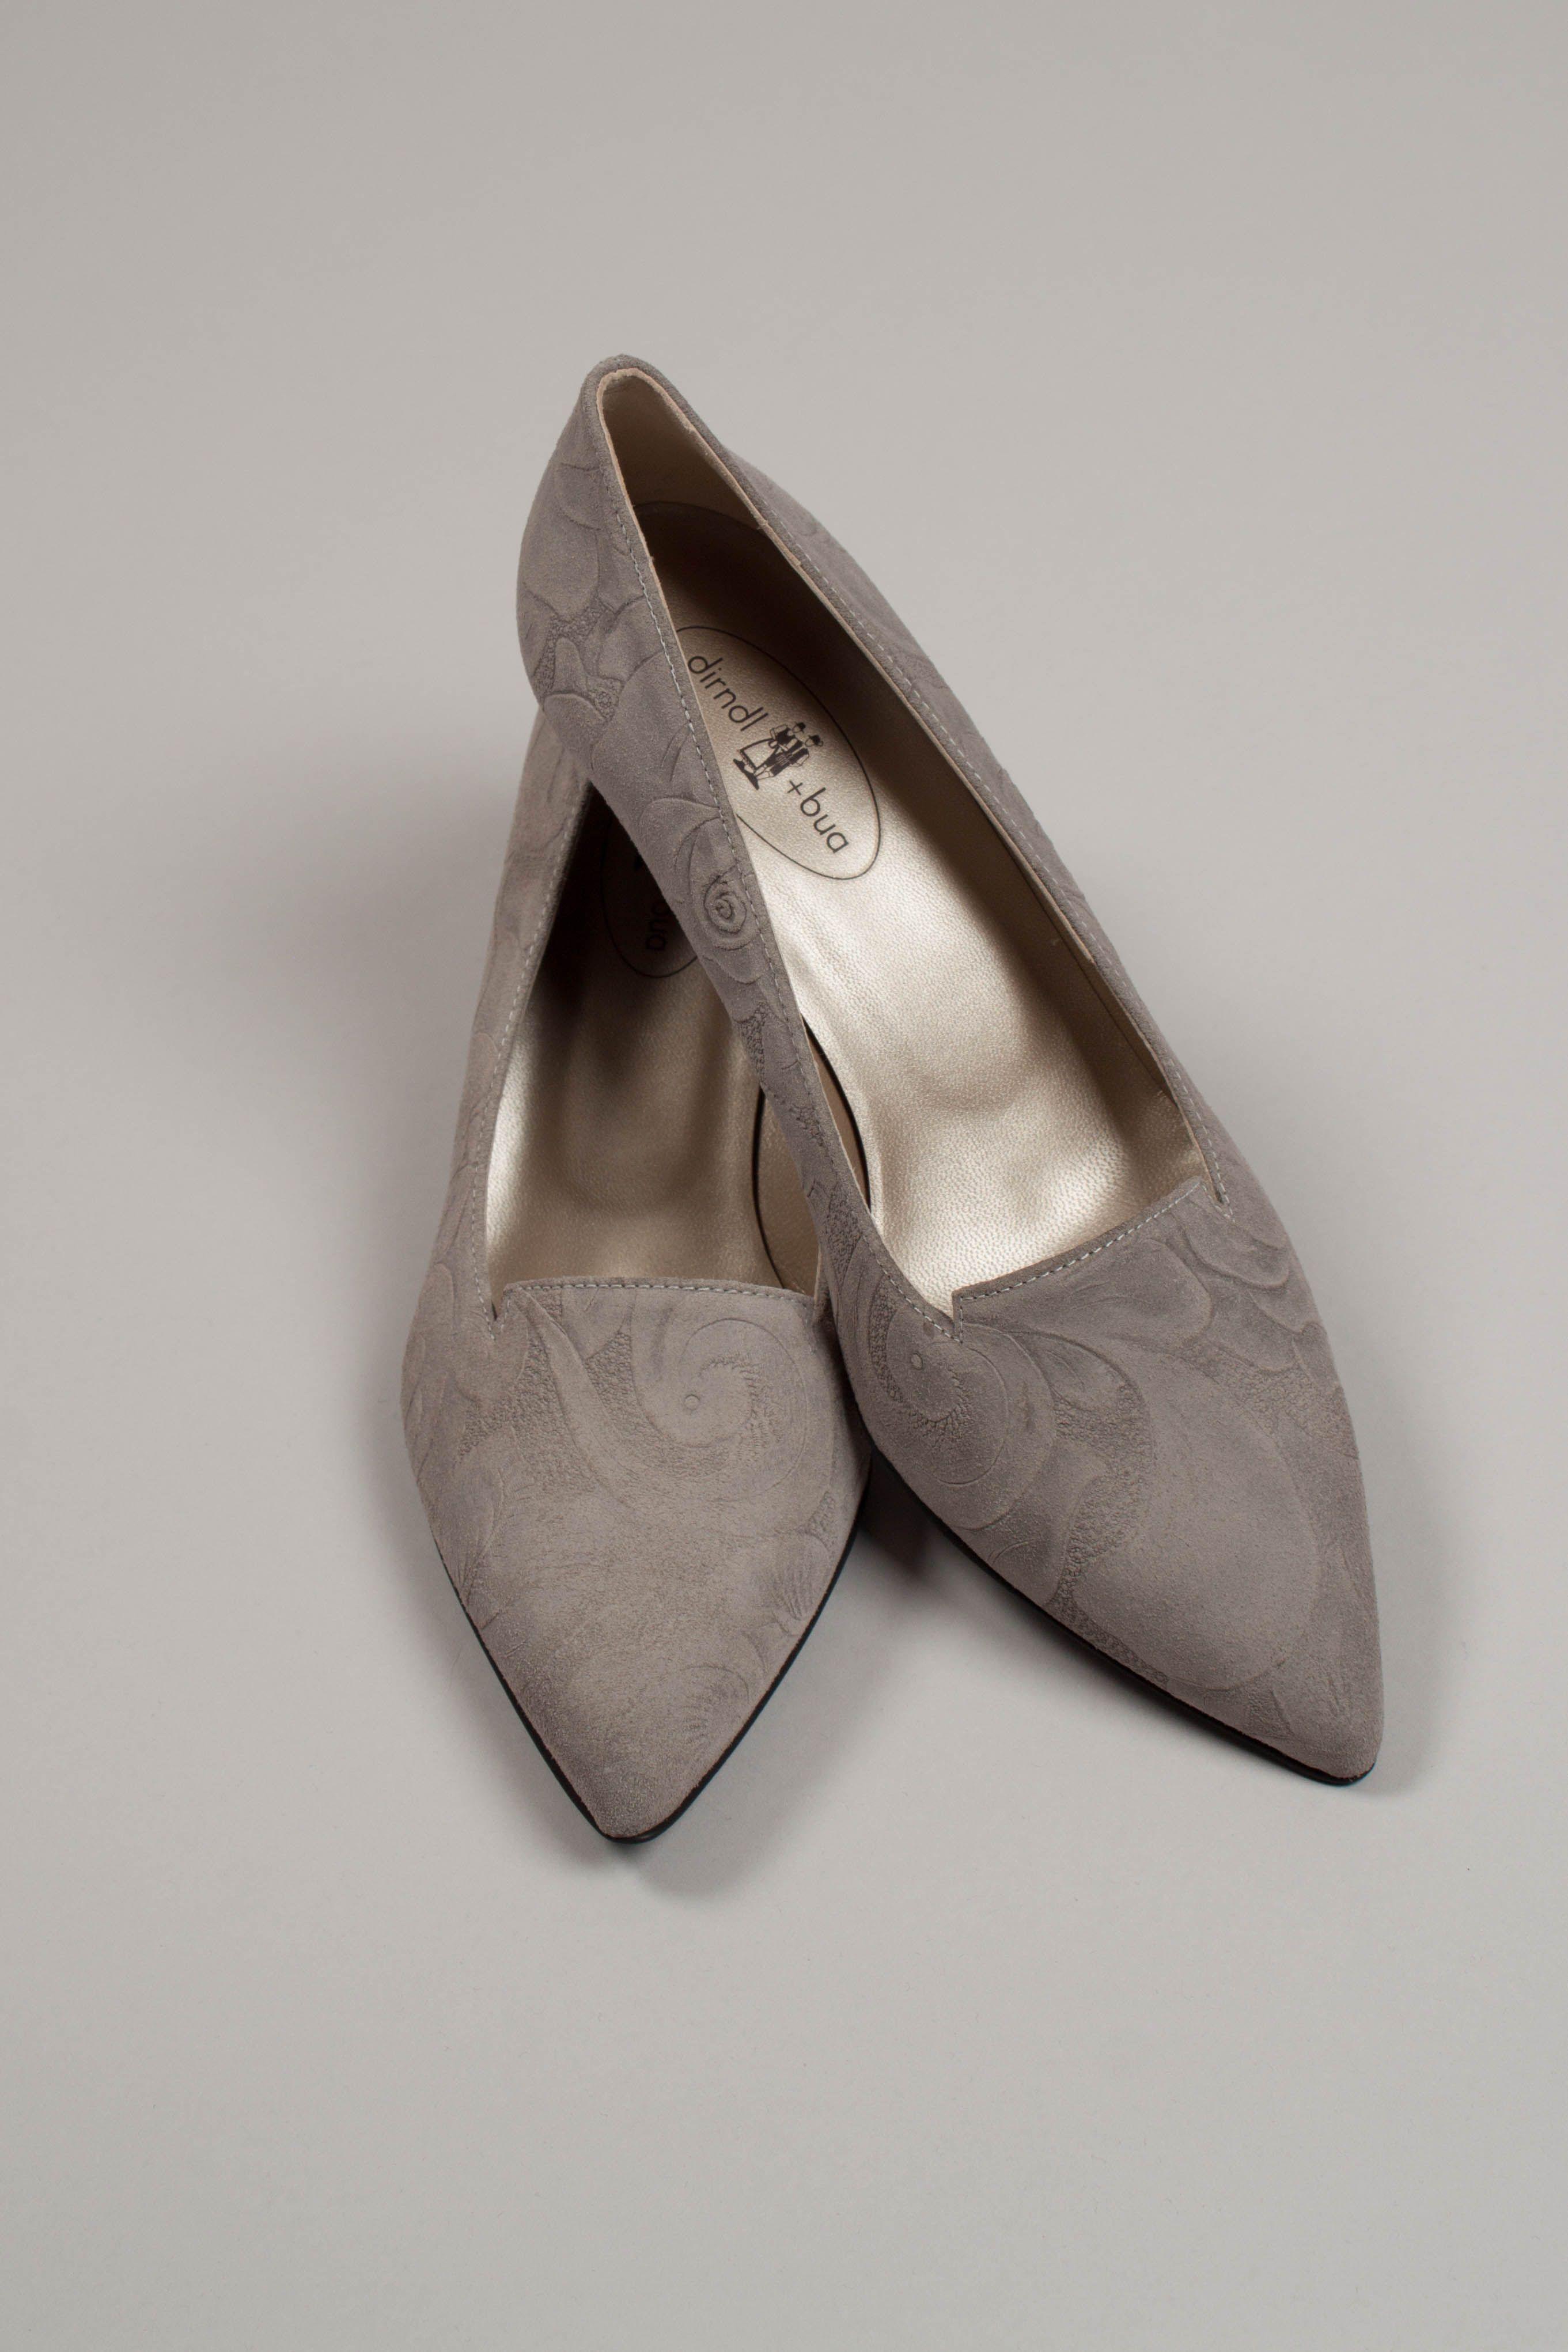 los angeles 2102b d8695 Tolle Schuhe von Dirndl + Bua. | Shoes | Dirndl schuhe ...